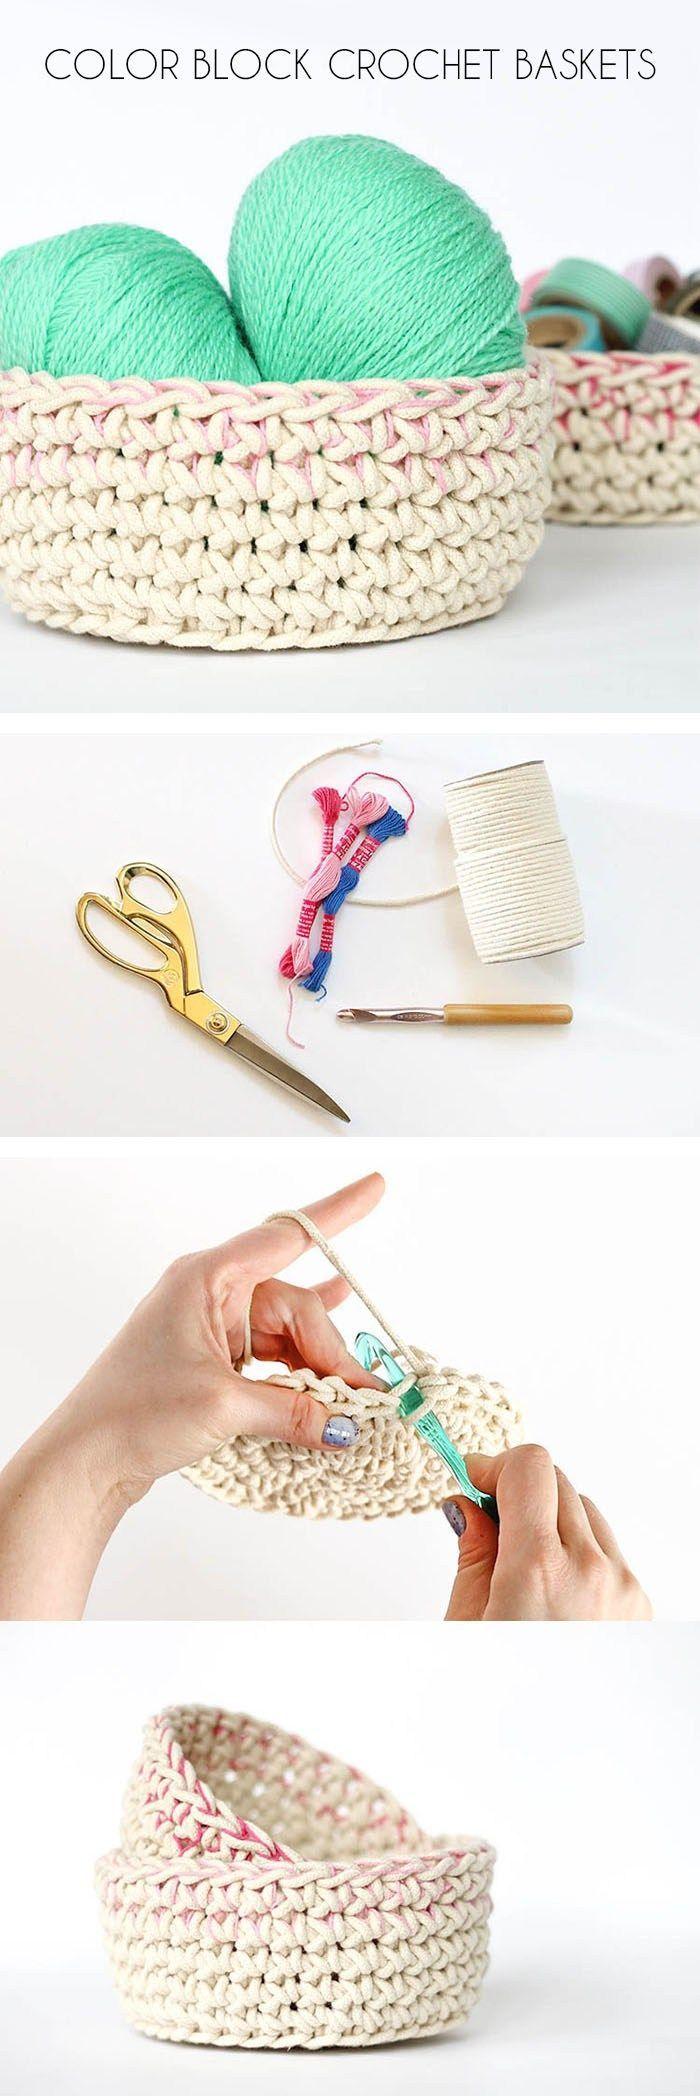 Color Block Crochet Baskets - Free Pattern | Trapillo, Ganchillo y ...